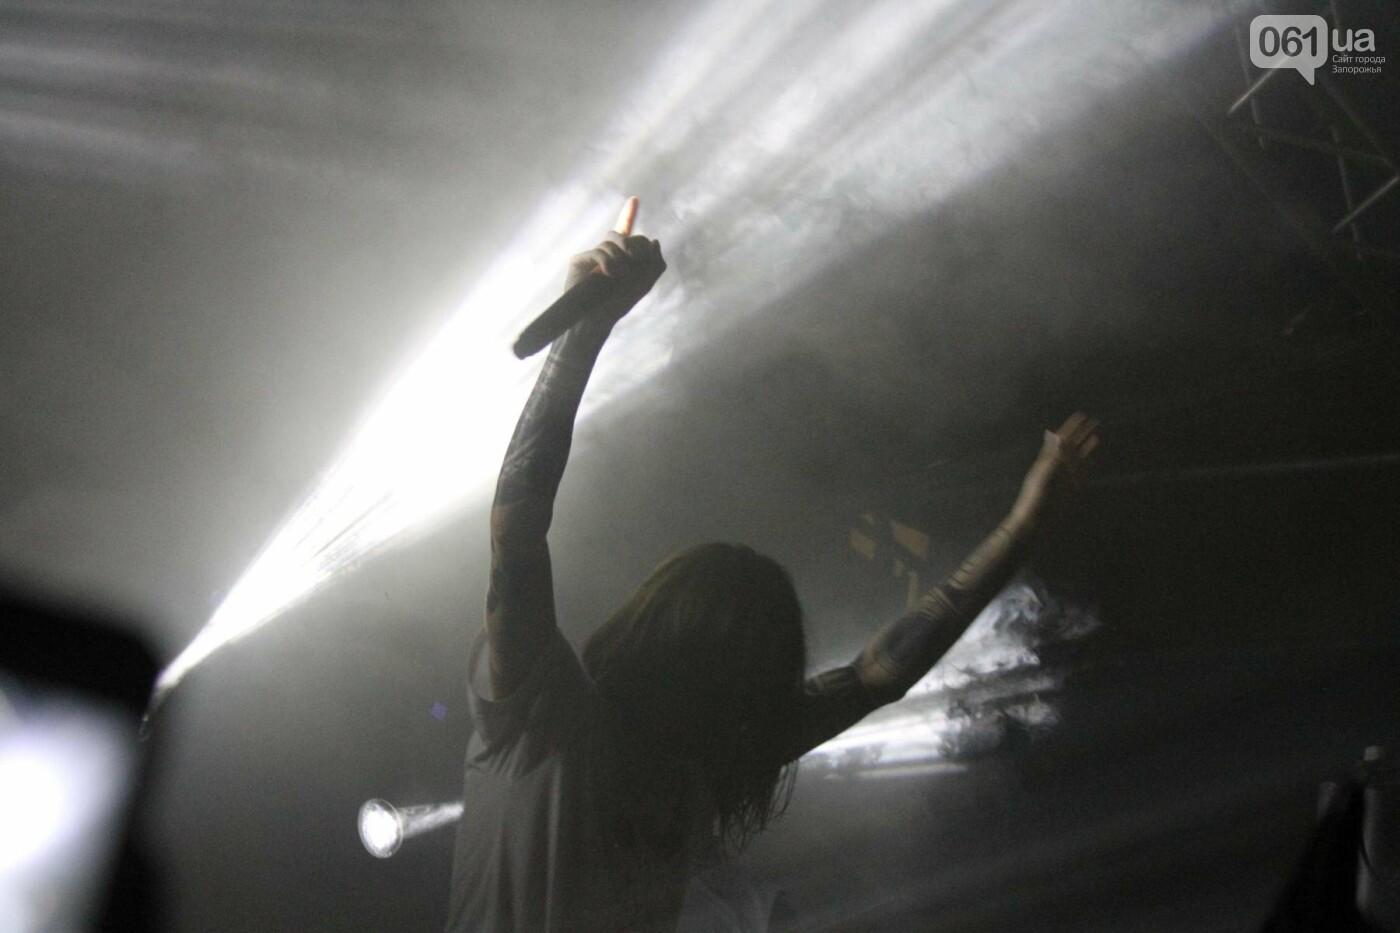 ALEKSEEV, «Агонь» и MamaRika: в Запорожье звезды устроили яркий концерт на «Miss AVRORA Summer 2018», – ФОТОРЕПОРТАЖ, фото-16